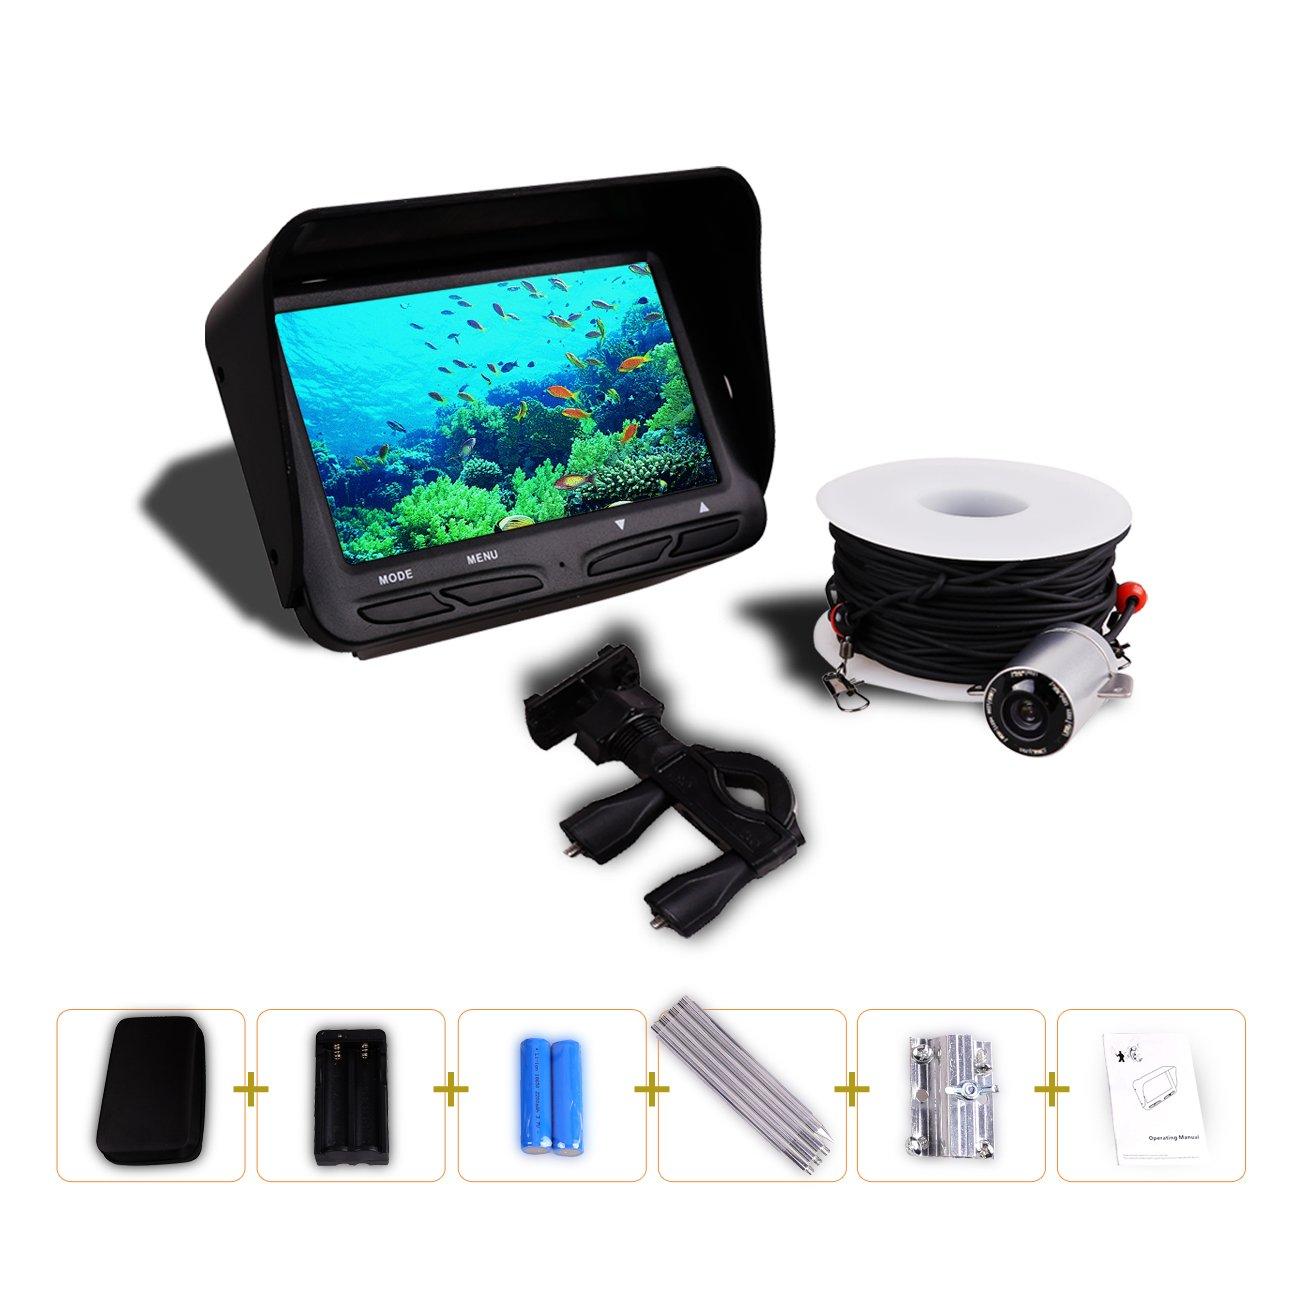 Gobing Fishing Finder , 4.3 inch TFT LCD Fishing Underwater Camera 140 Degree Wide Angle Lens Monitor for Boat,Kayak,Ice,Lake Fishing